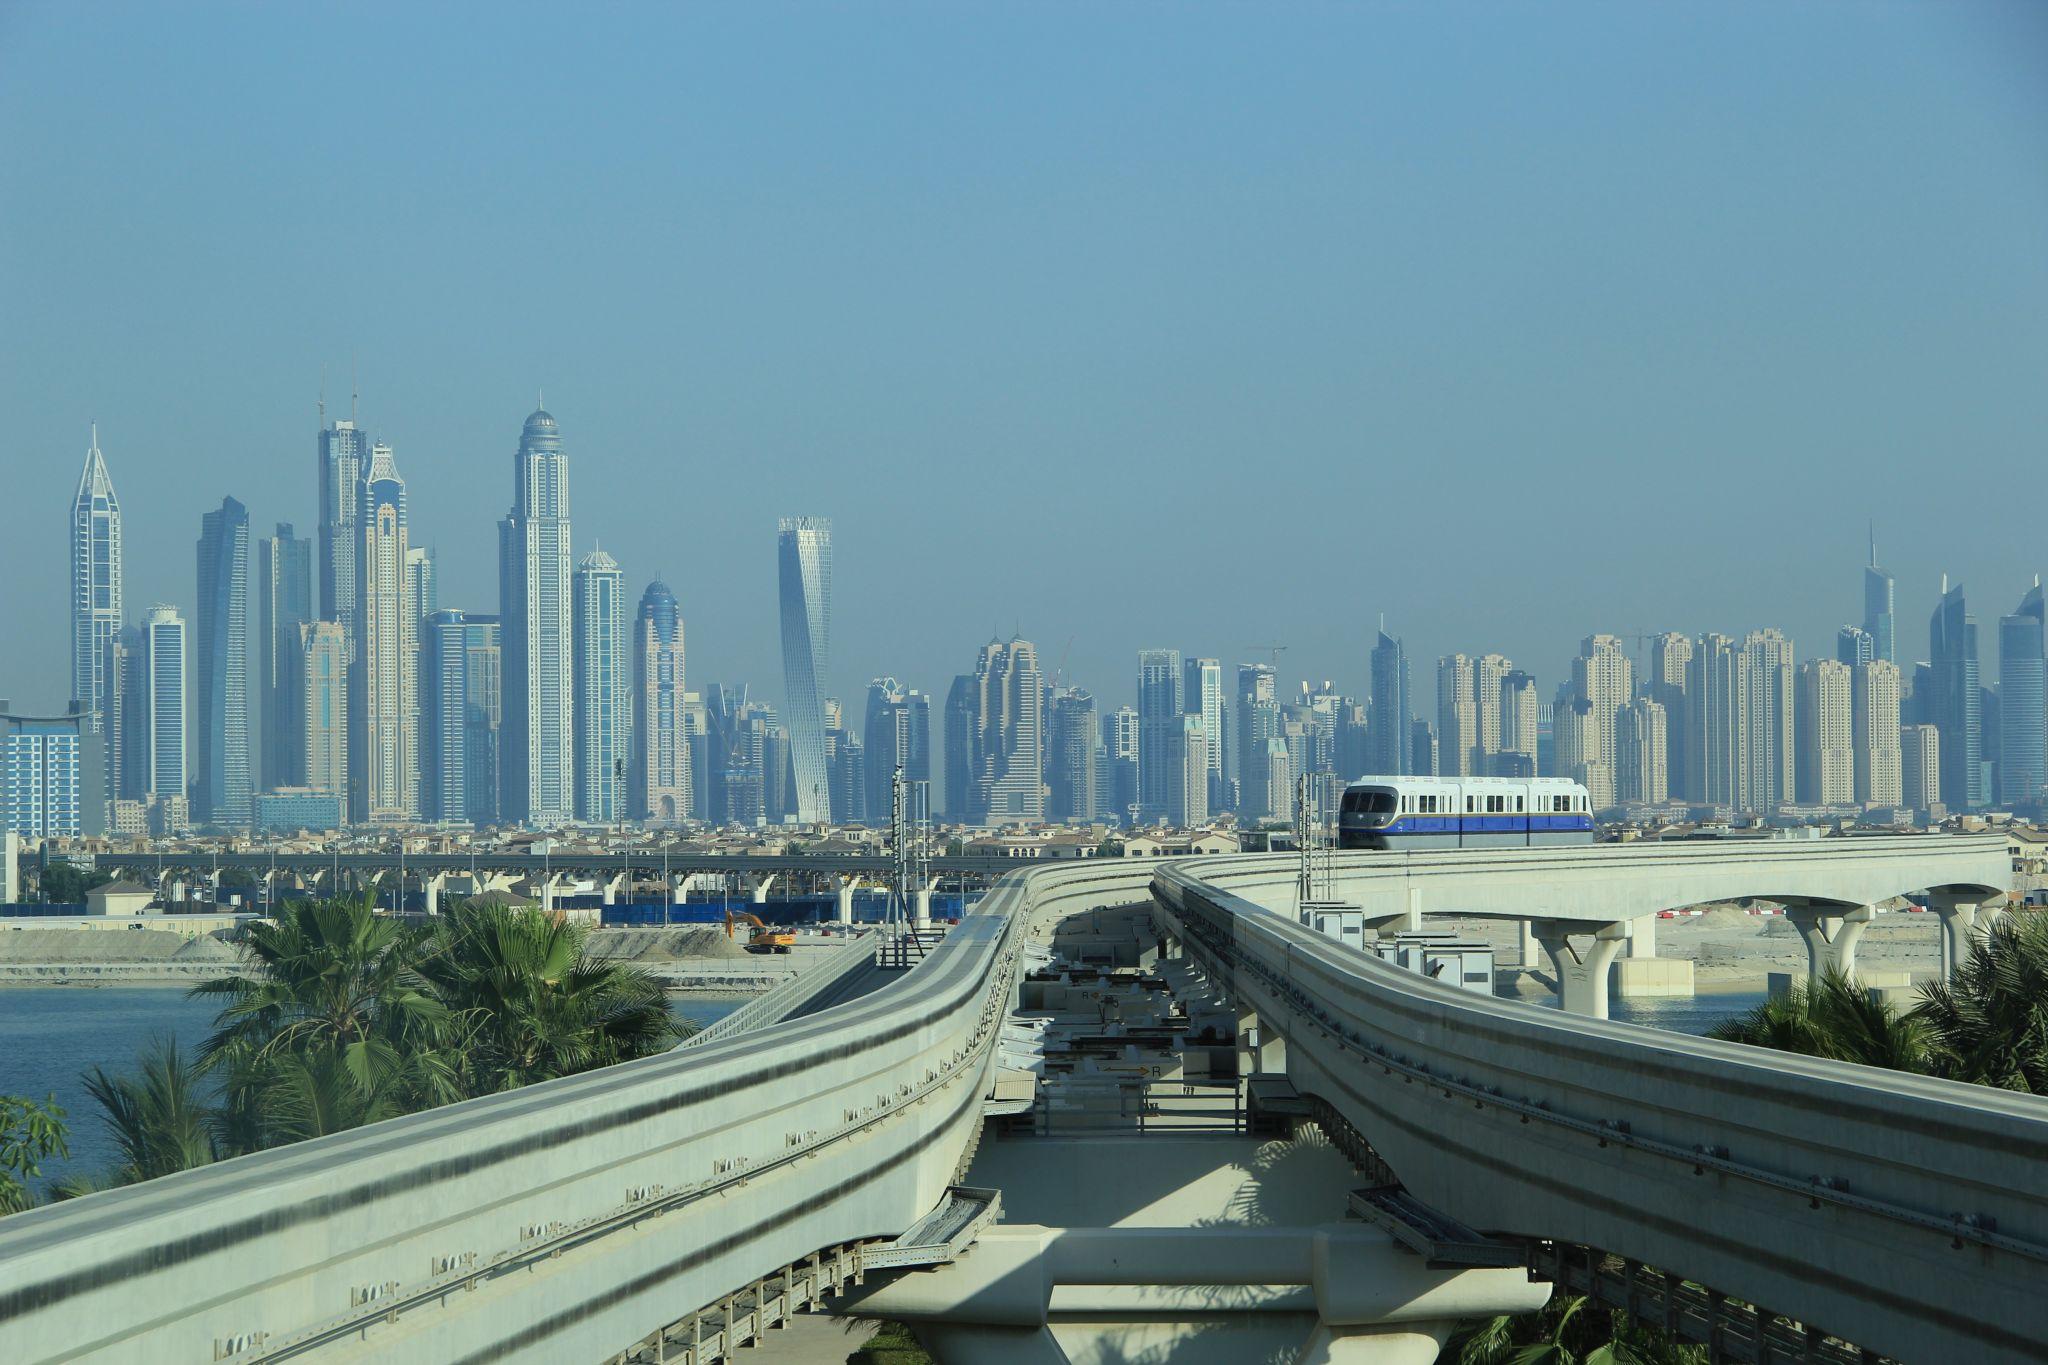 Palm Jumeirah Dubai, United Arab Emirates